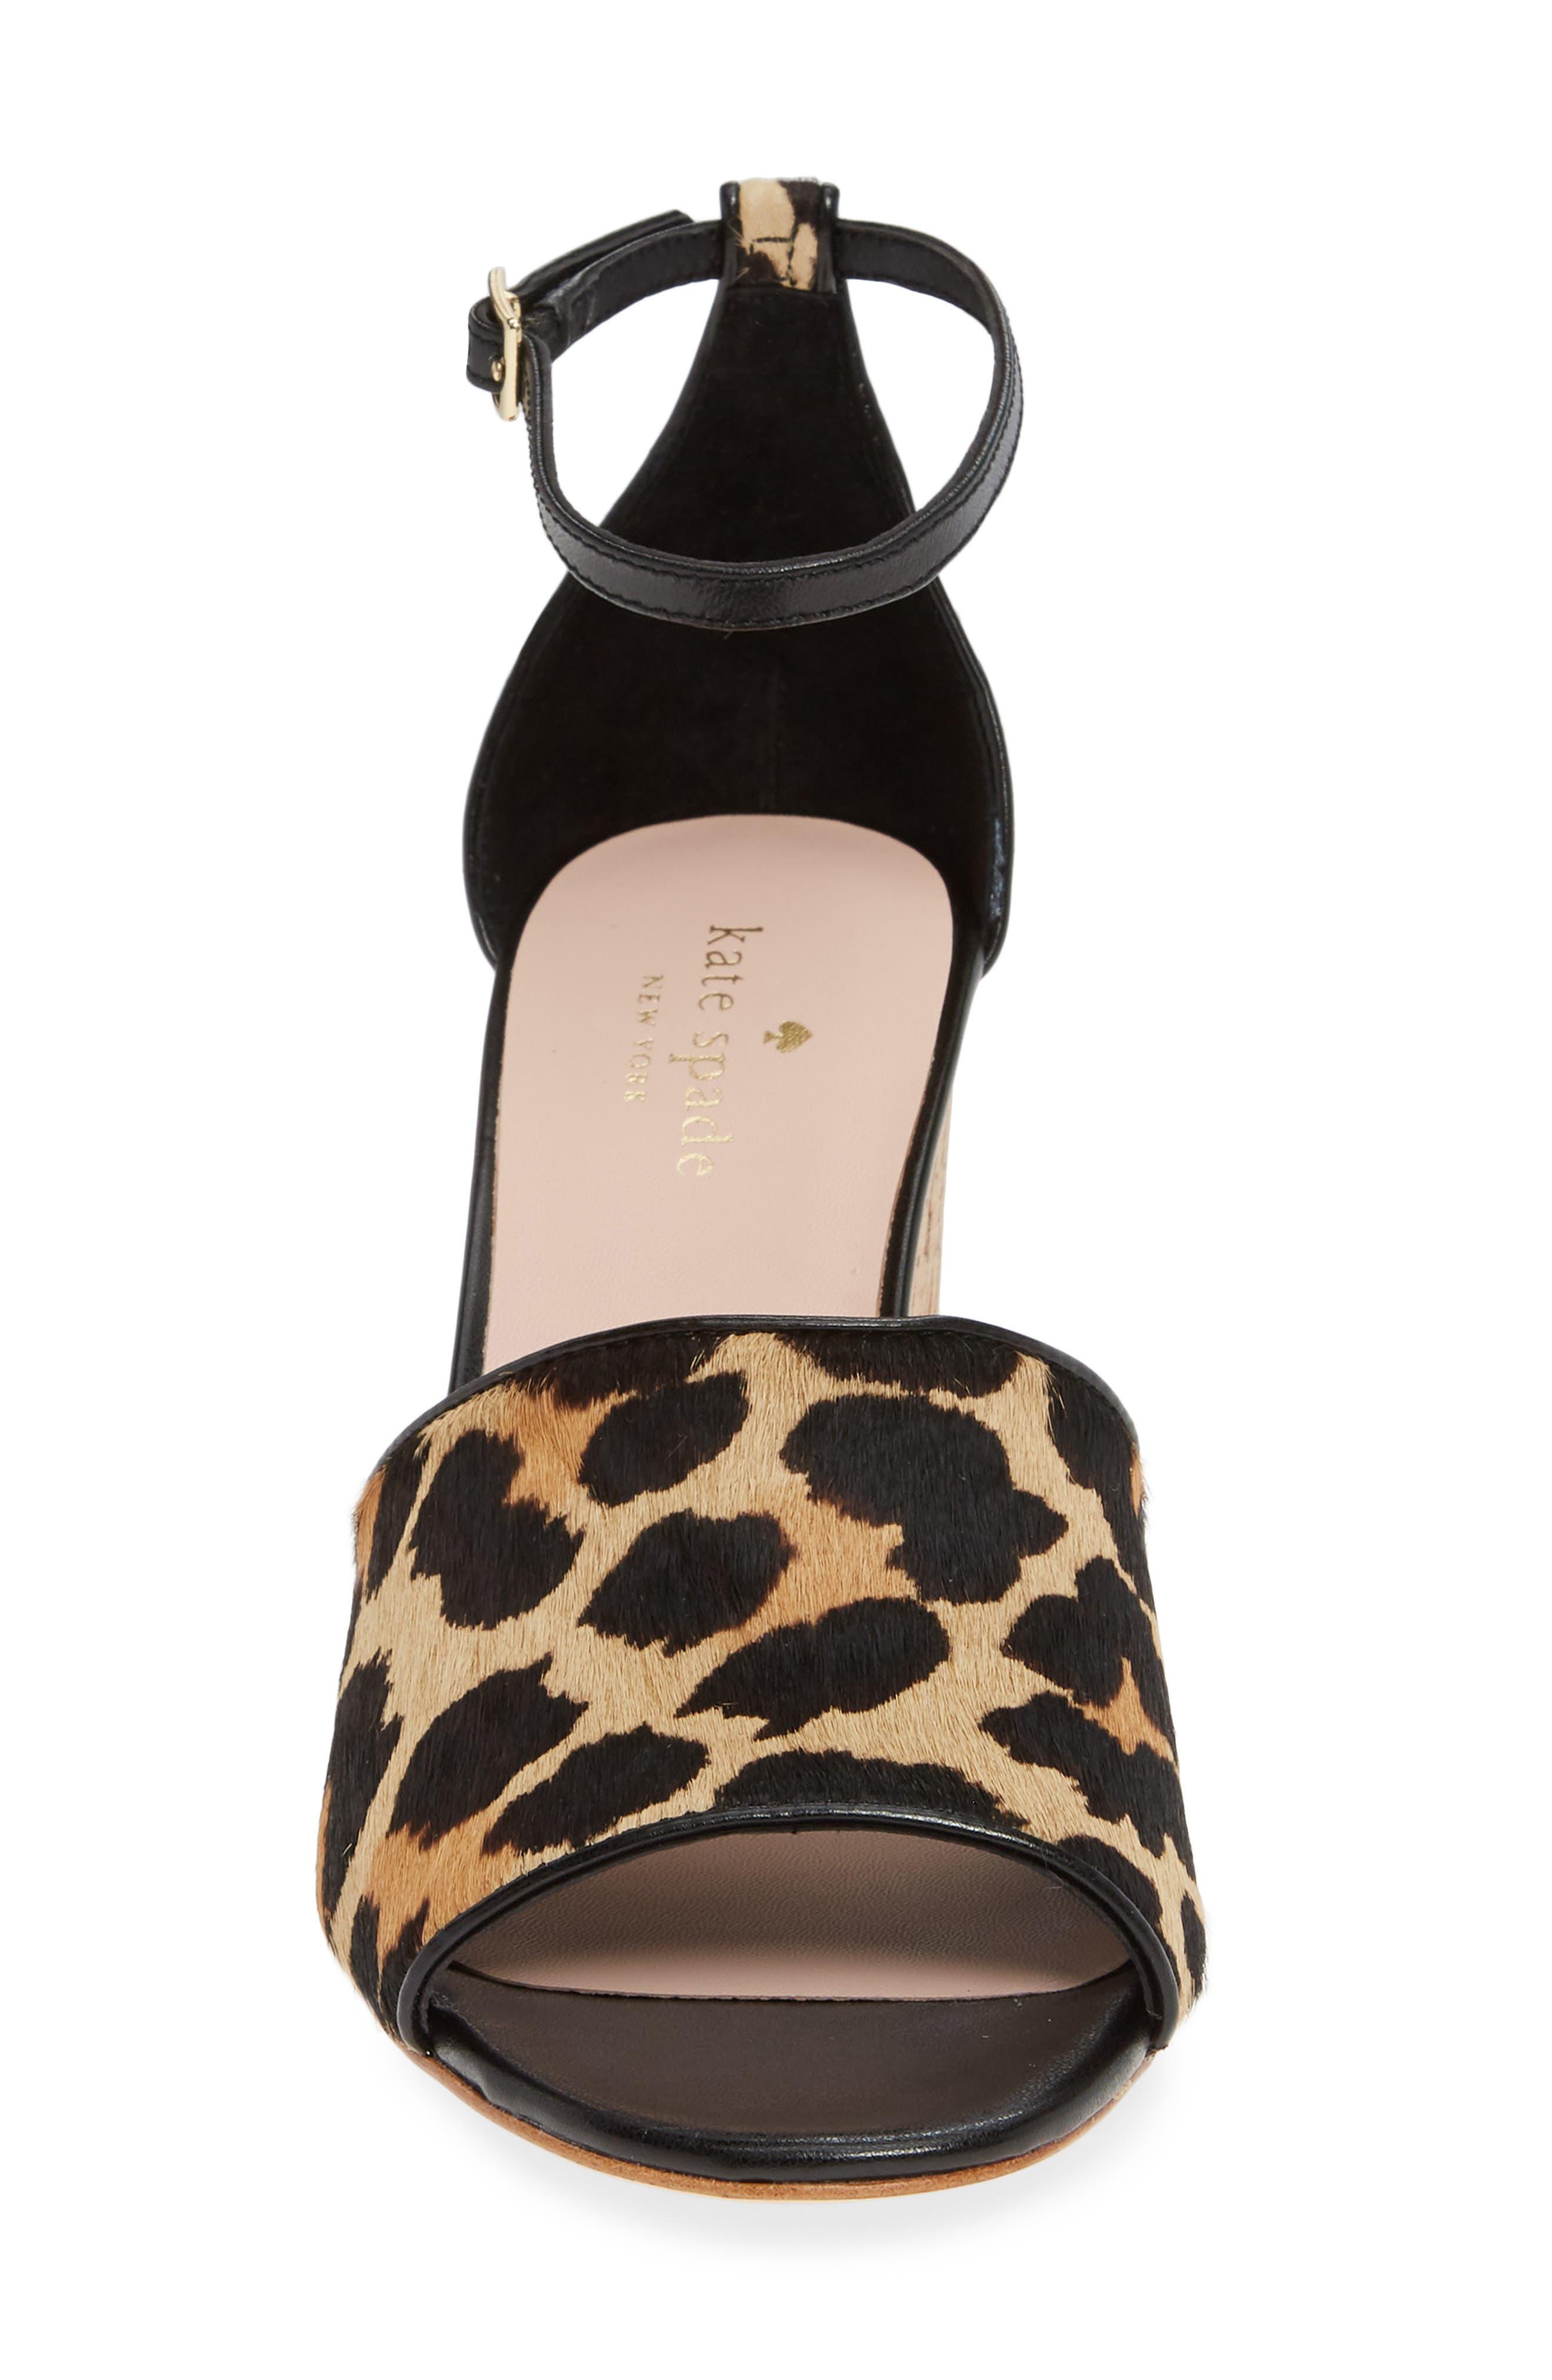 KATE SPADE NEW YORK,                             lonnie genuine calf hair wedge sandal,                             Alternate thumbnail 4, color,                             BLACK/ AMARETTO LEOPARD